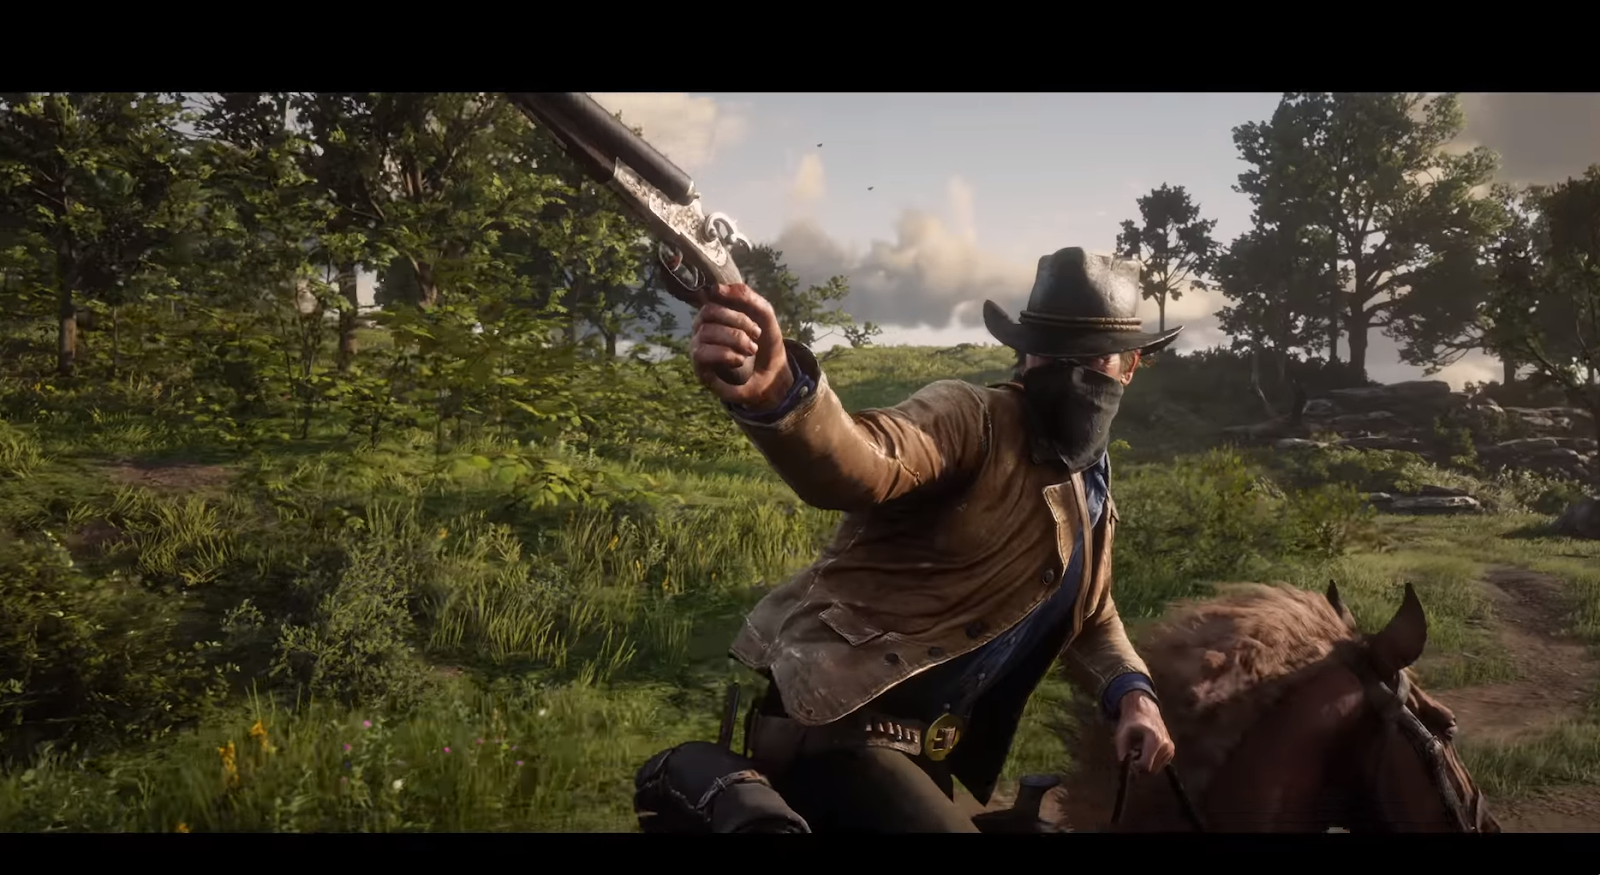 Red Dead Redemption 2 (PC): confira o trailer de lançamento - GameBlast